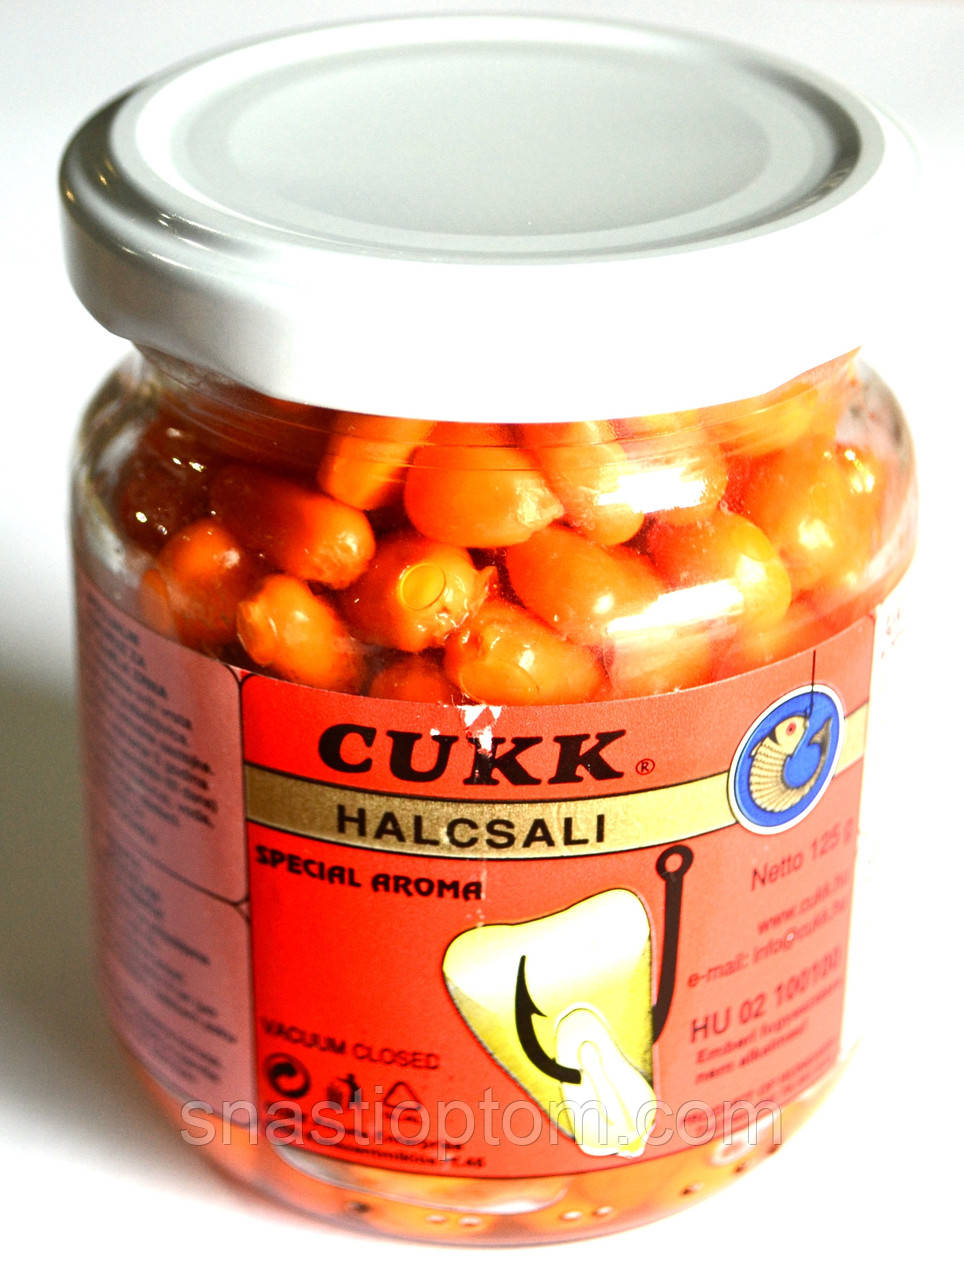 Кукуруза Cukk сухая, Тутти-фрутти, 125 гр